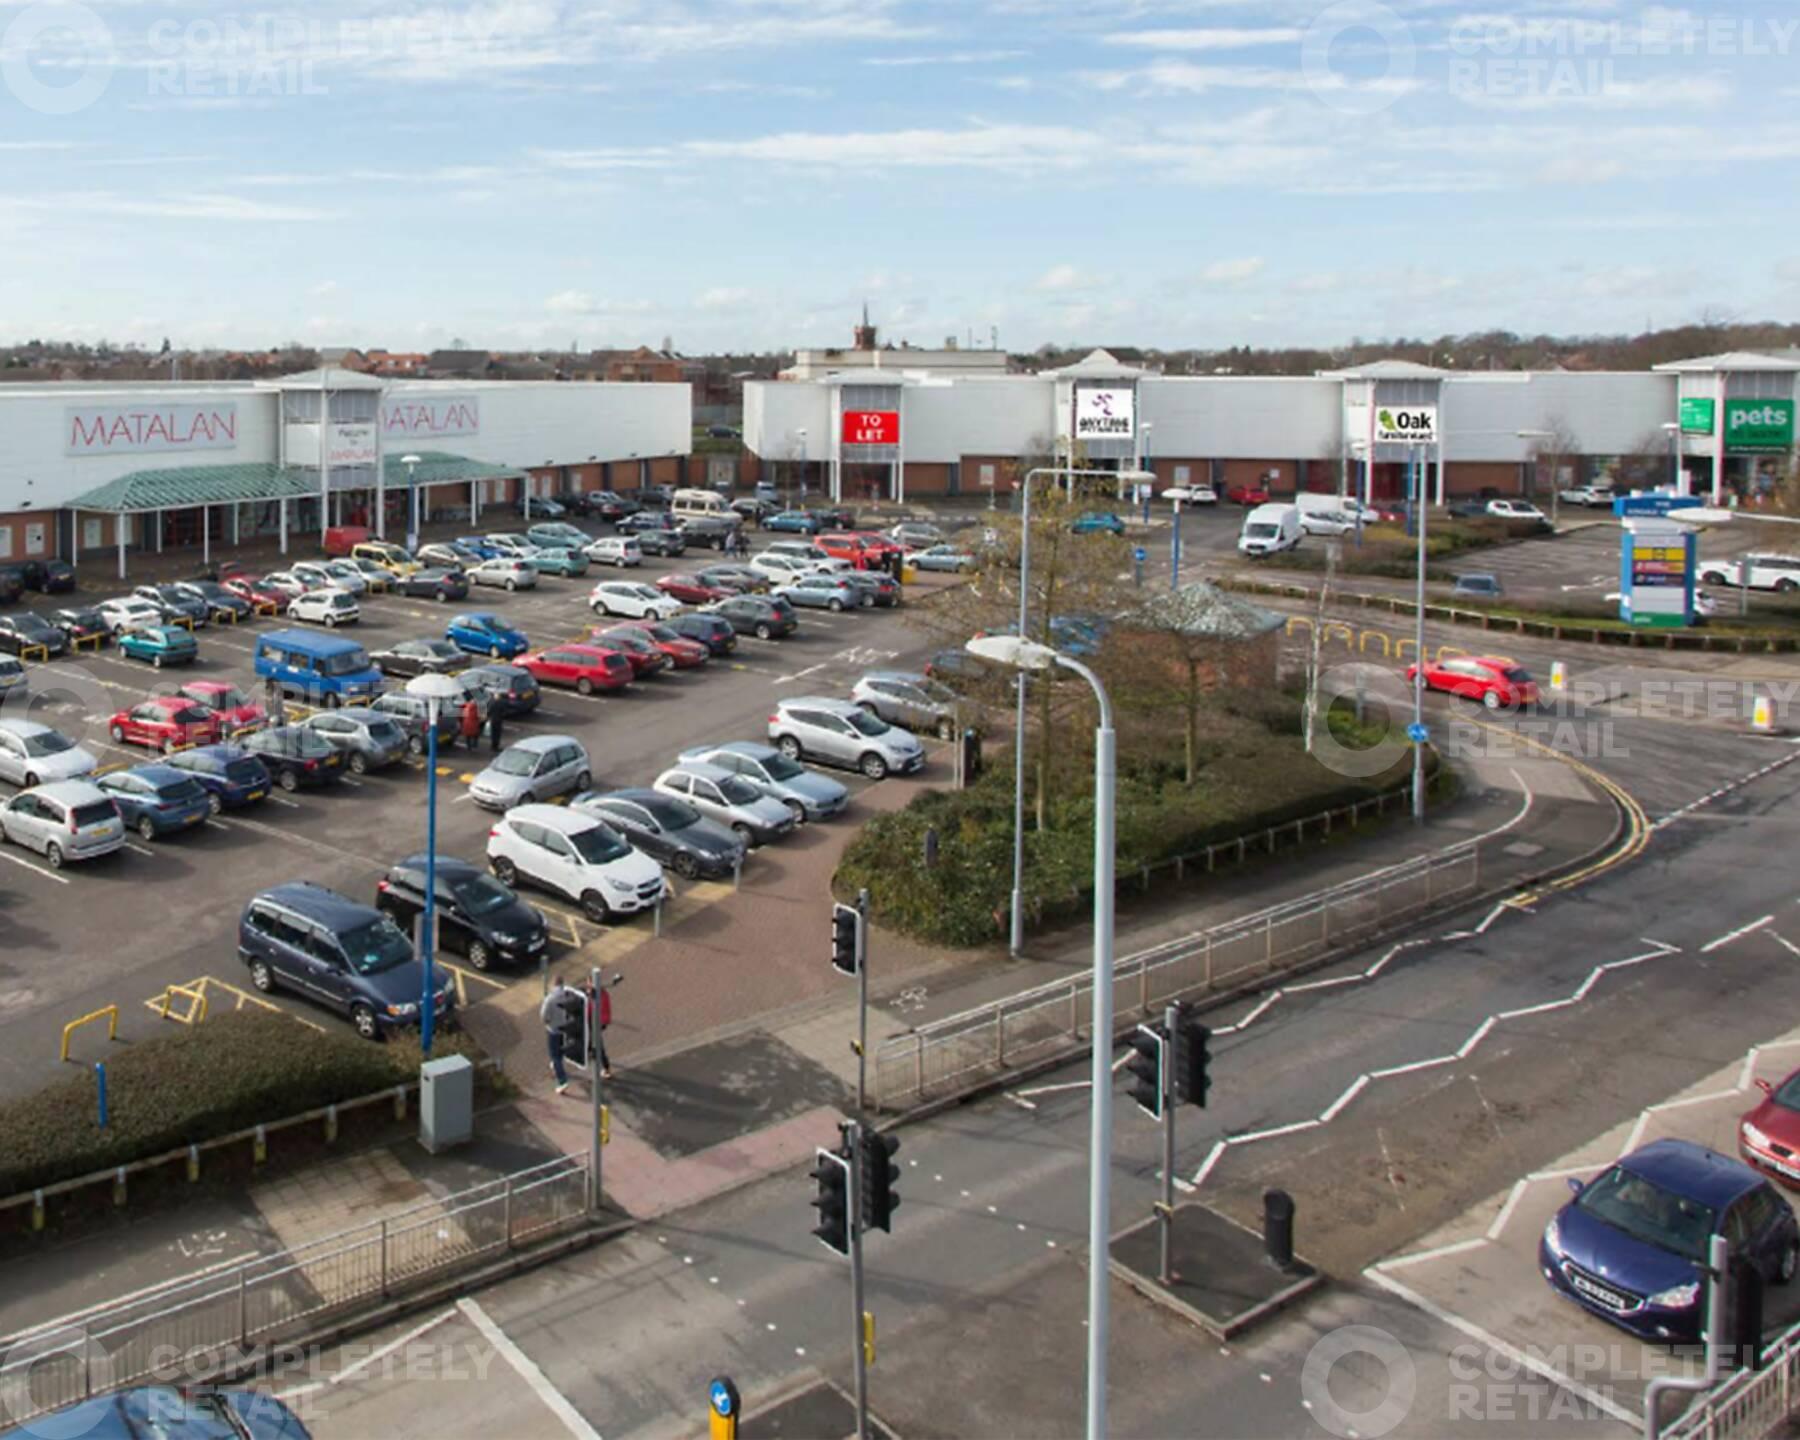 The Broad Centre Retail Park